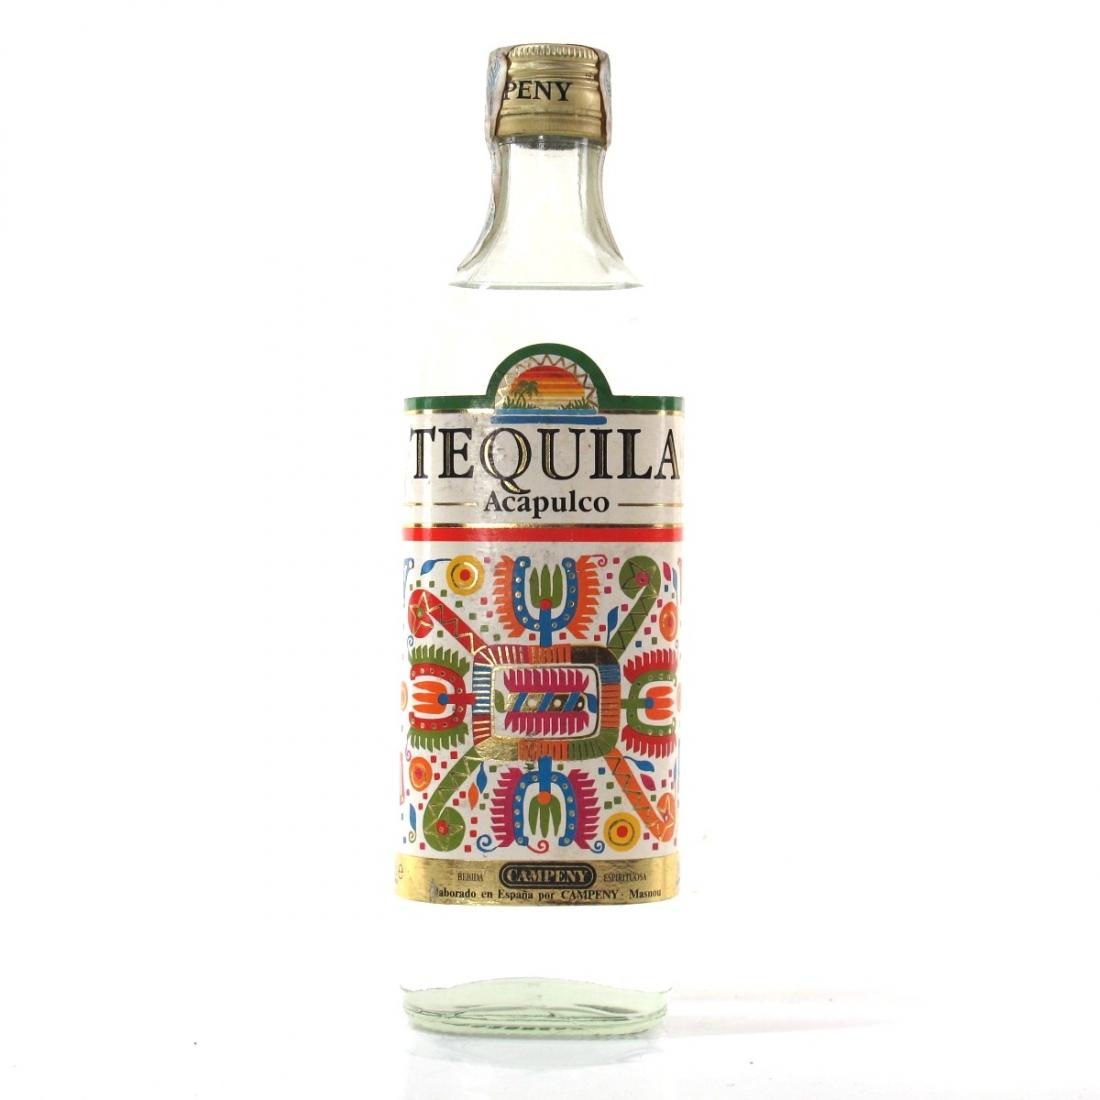 Acapulco Tequila